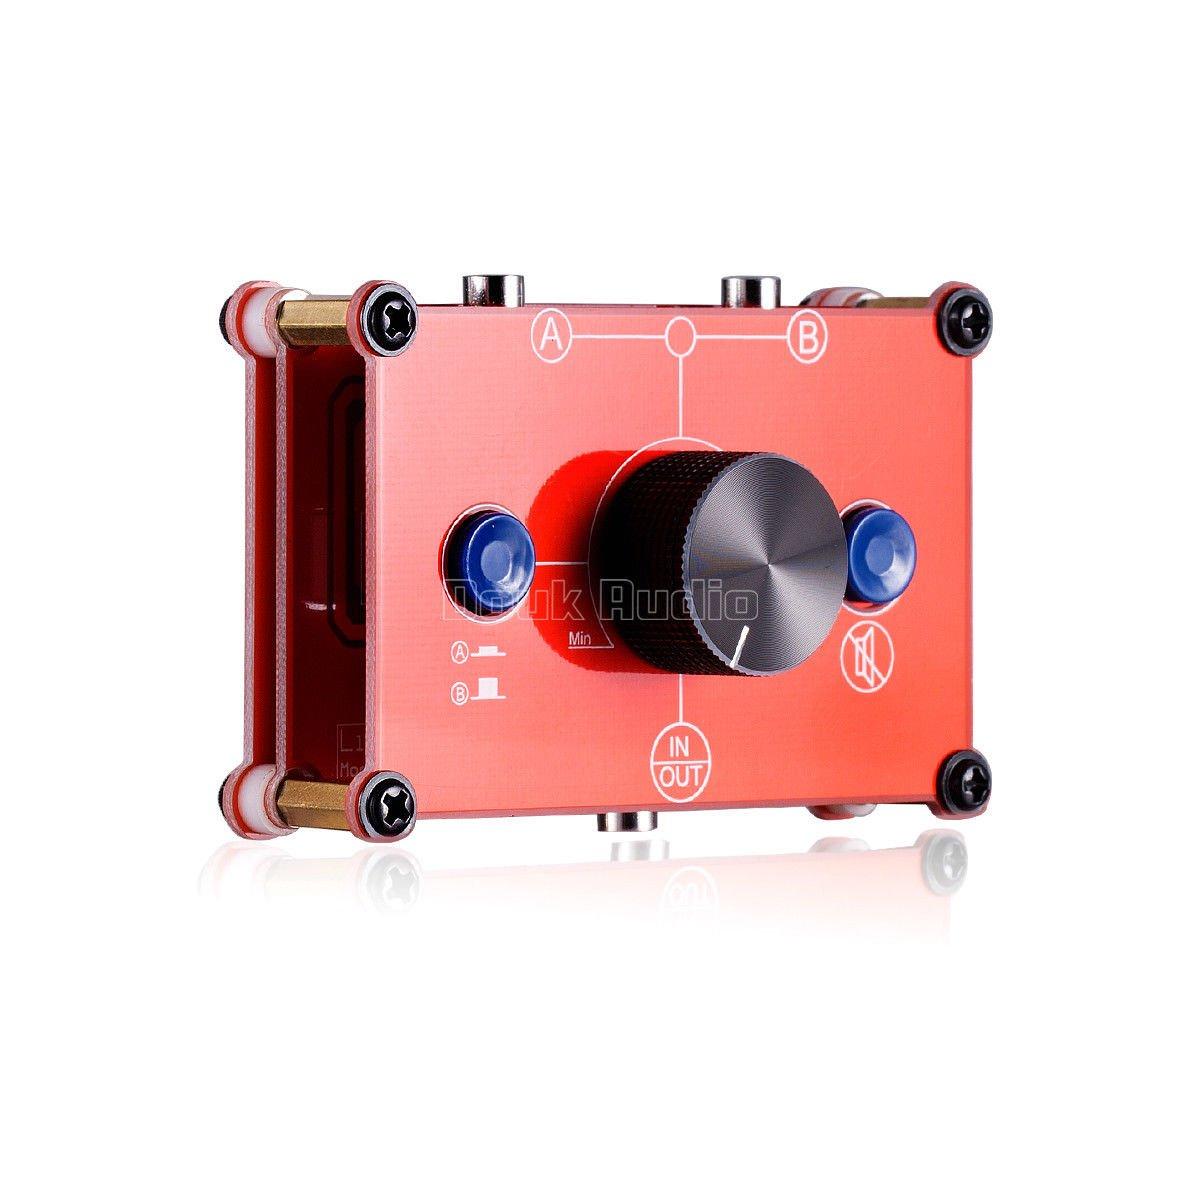 Nobsound Little Bear MC1022 Mini 2(1)-IN-1(2)-OUT RCA Stereo Audio Switcher Passive Selector Splitter Box (Black (RCA Version)) GFJ572